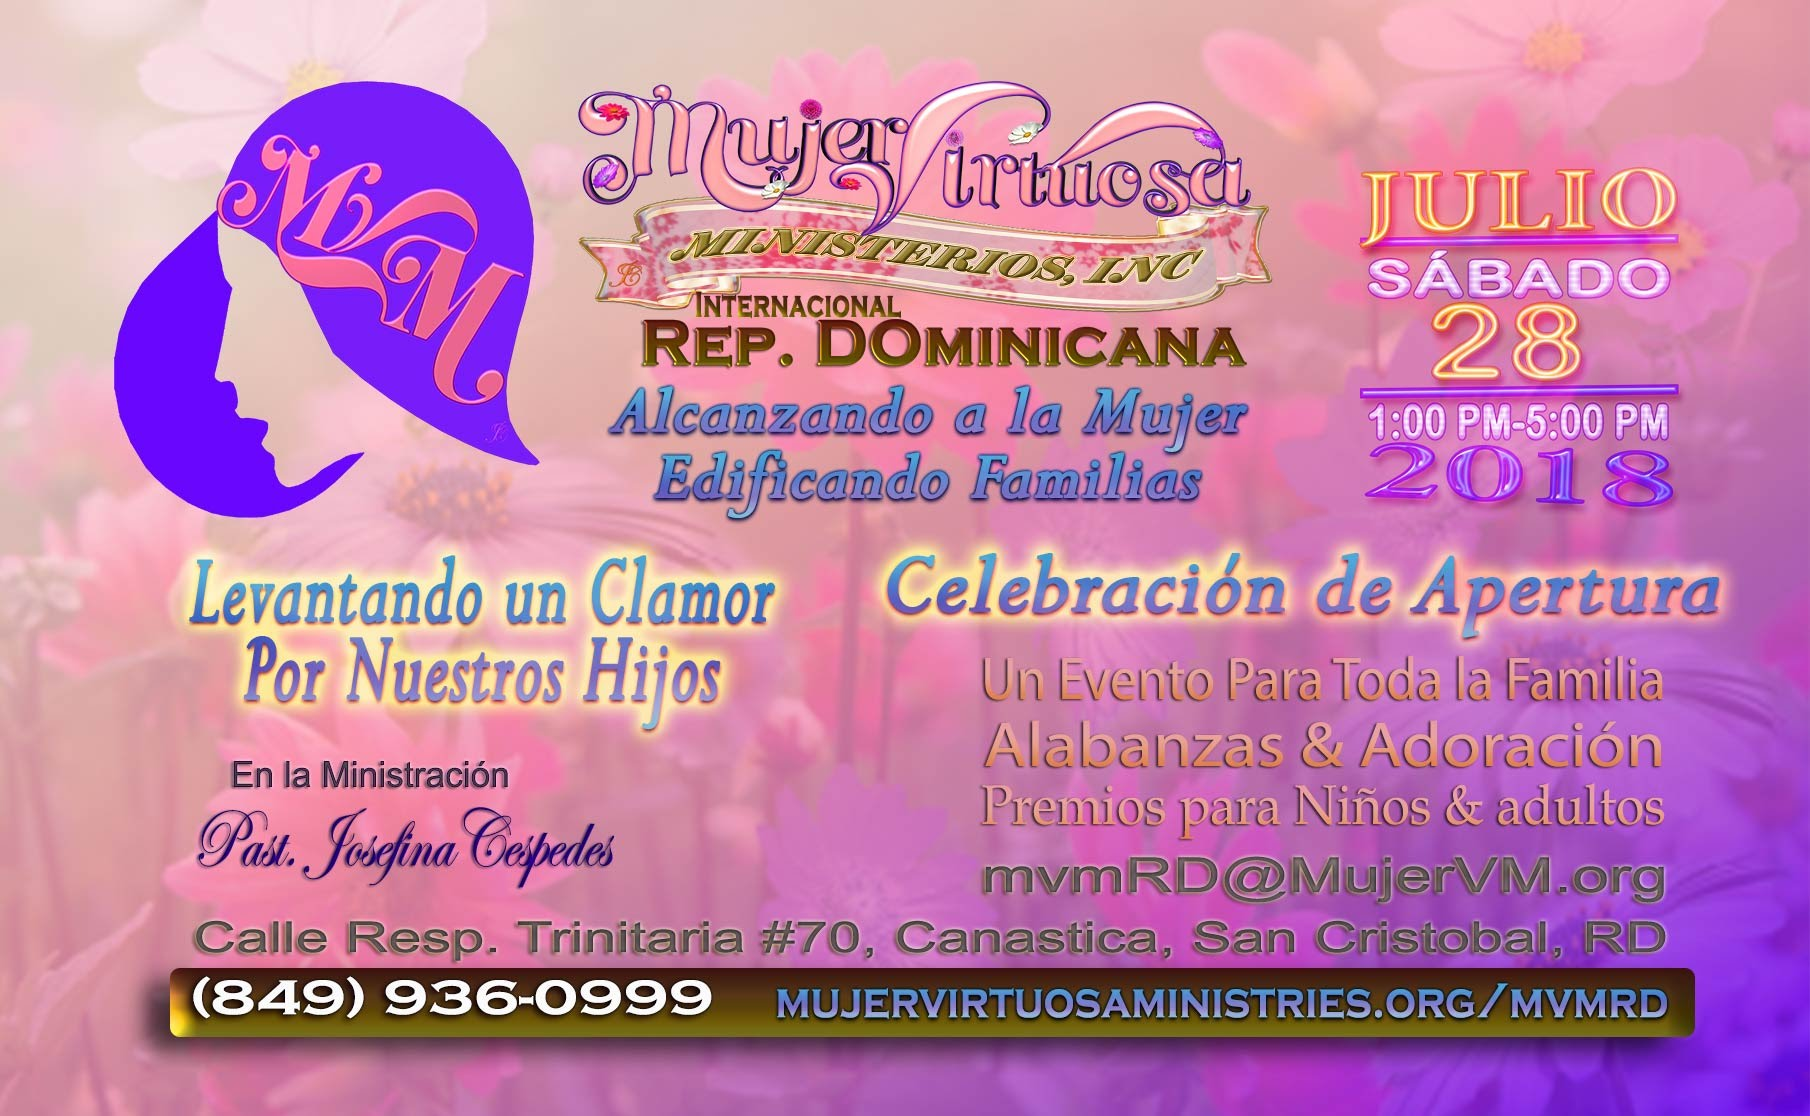 Mujer Virtuosa Rep. Dominicana Apertura